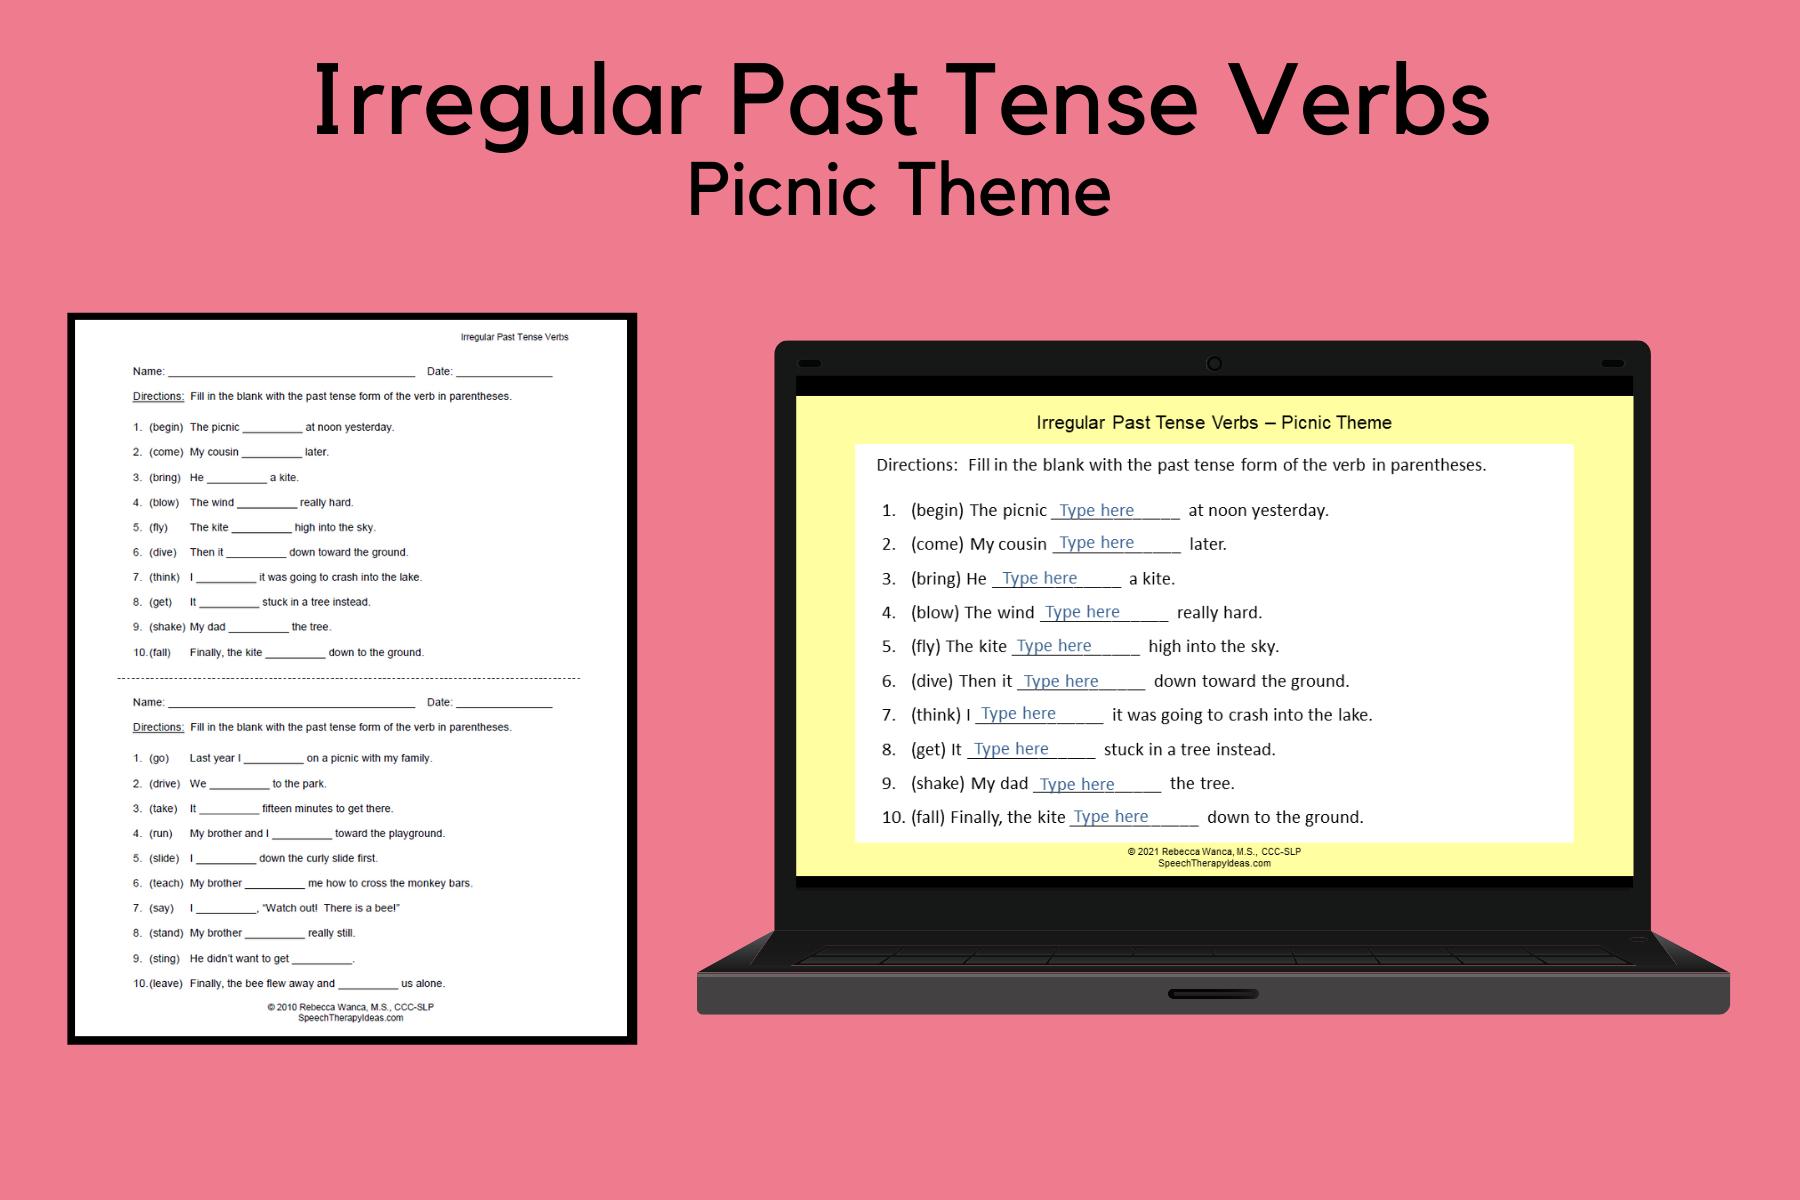 Irregular Past Tense Verbs – Picnic Theme